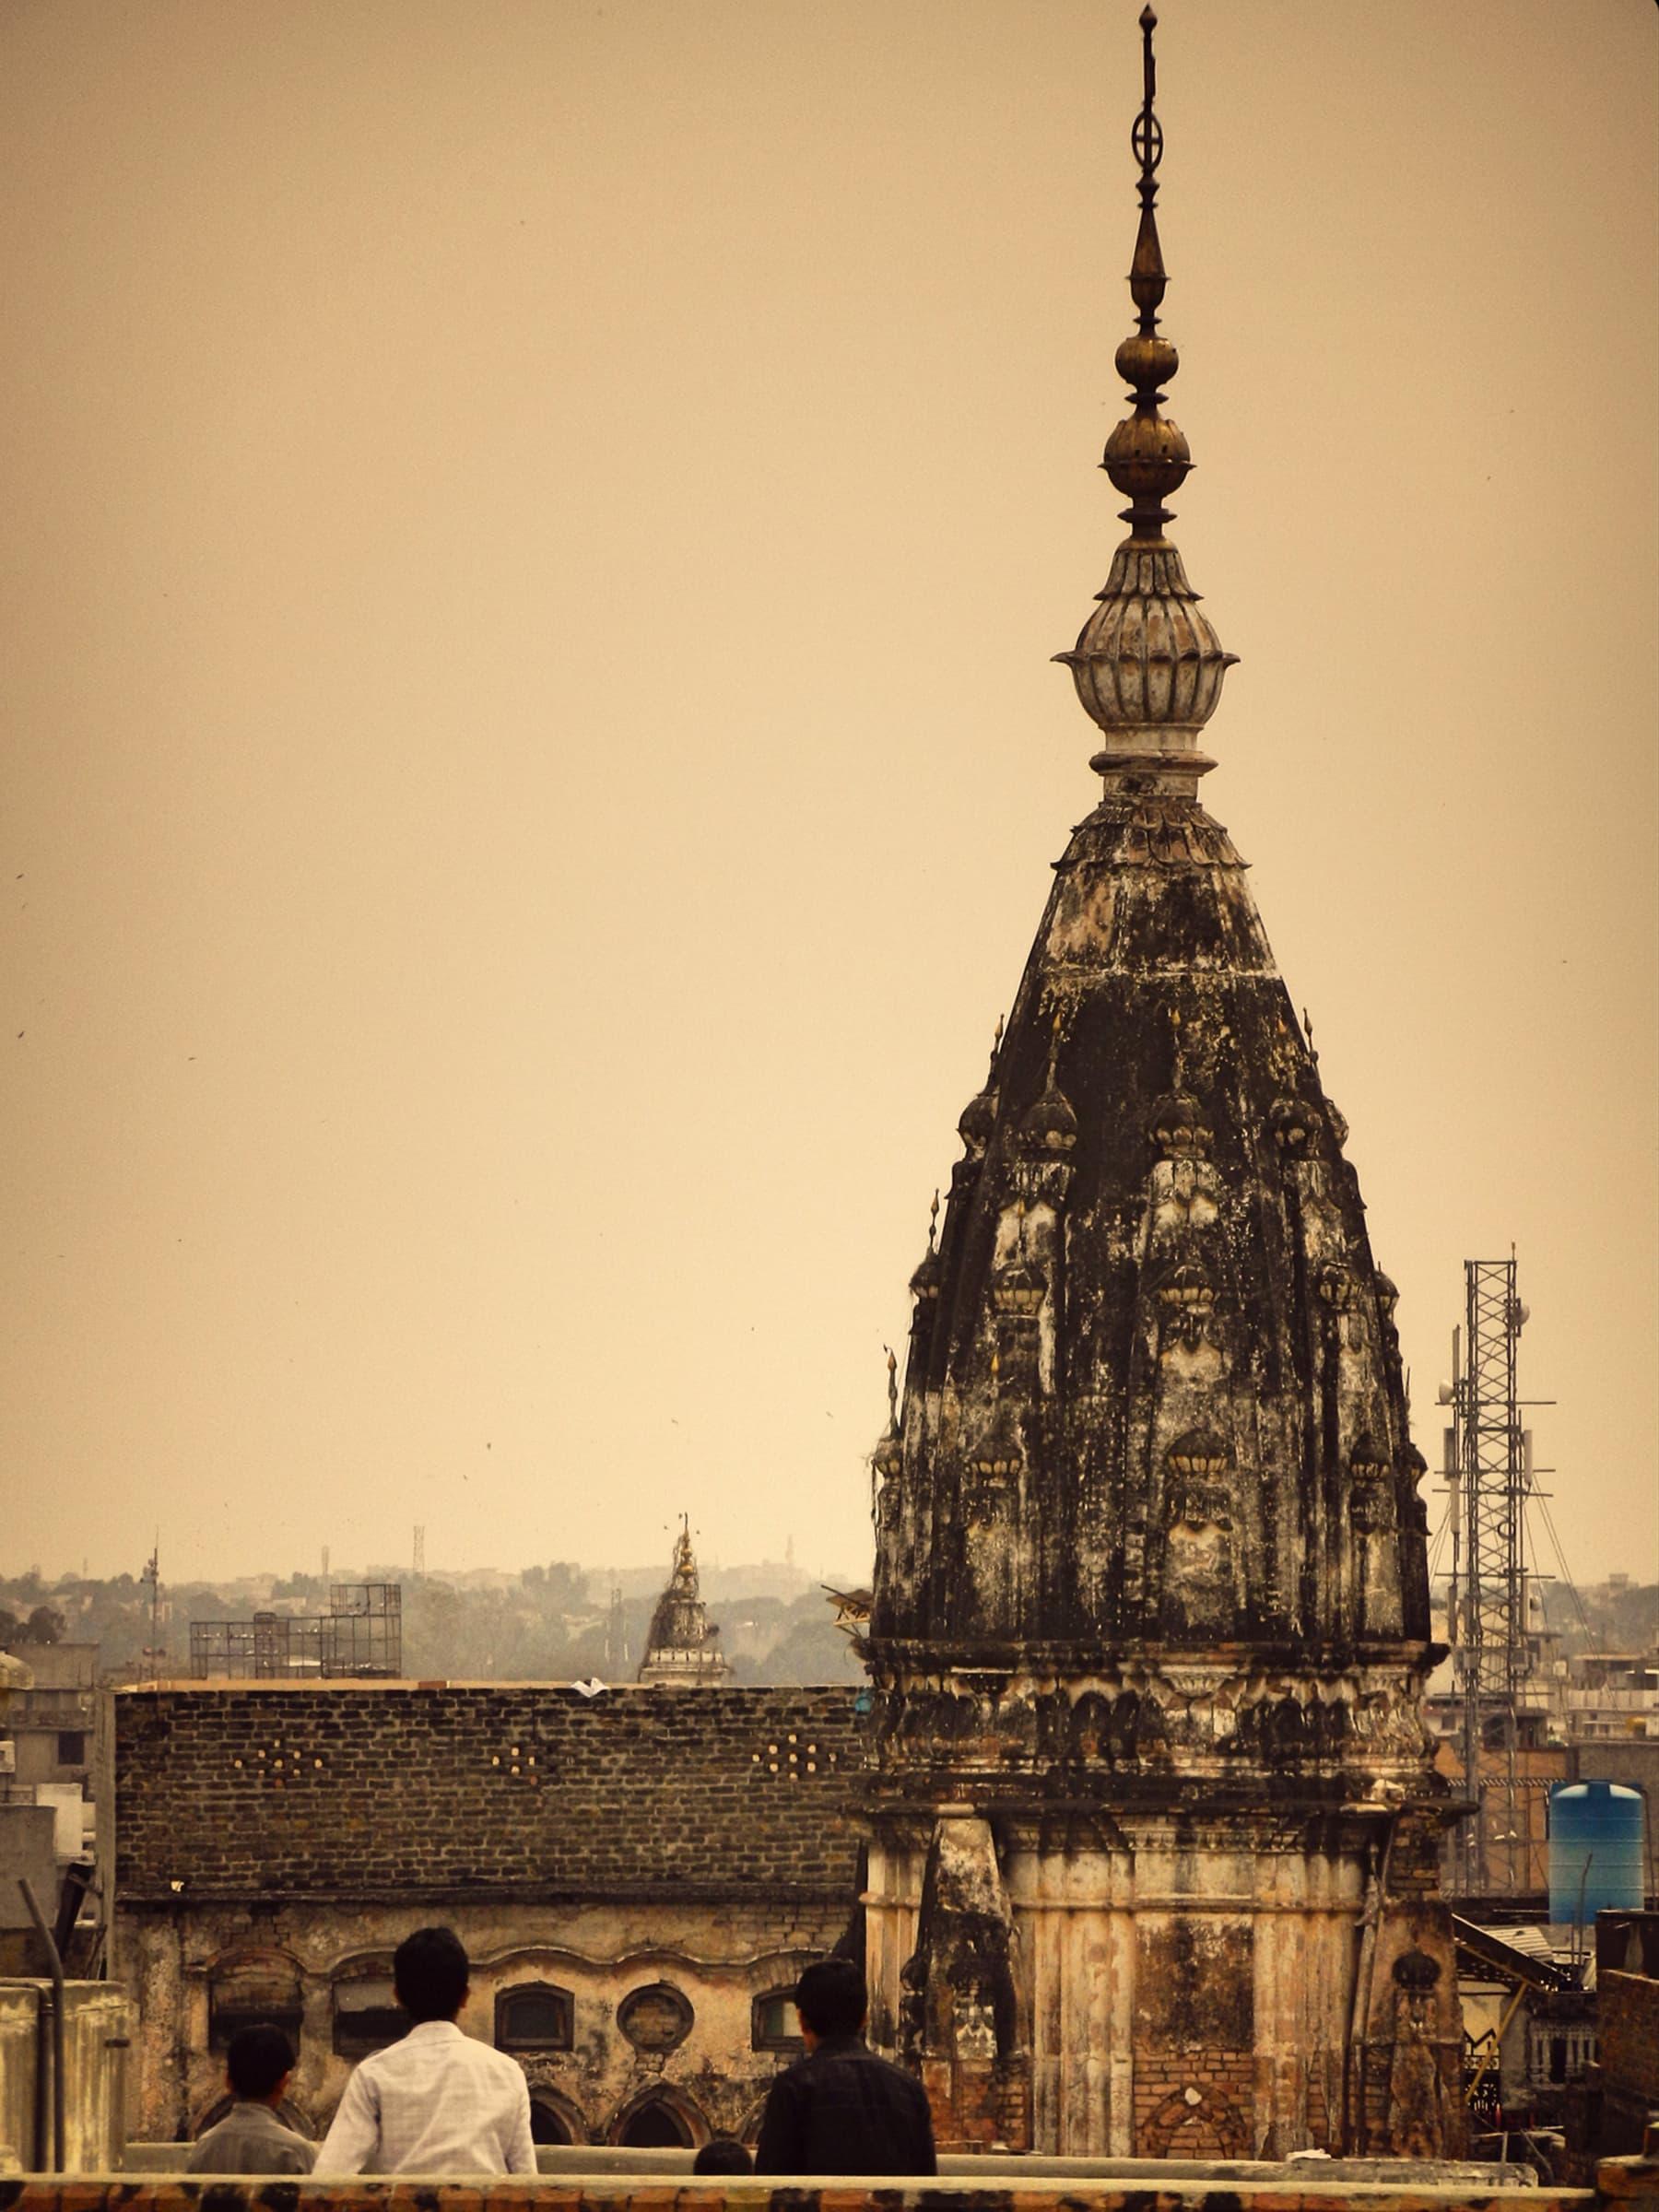 Mandir spire in Bhabra bazaar visible from Sujan Singh Haveli.—Muhammad Bin Naveed